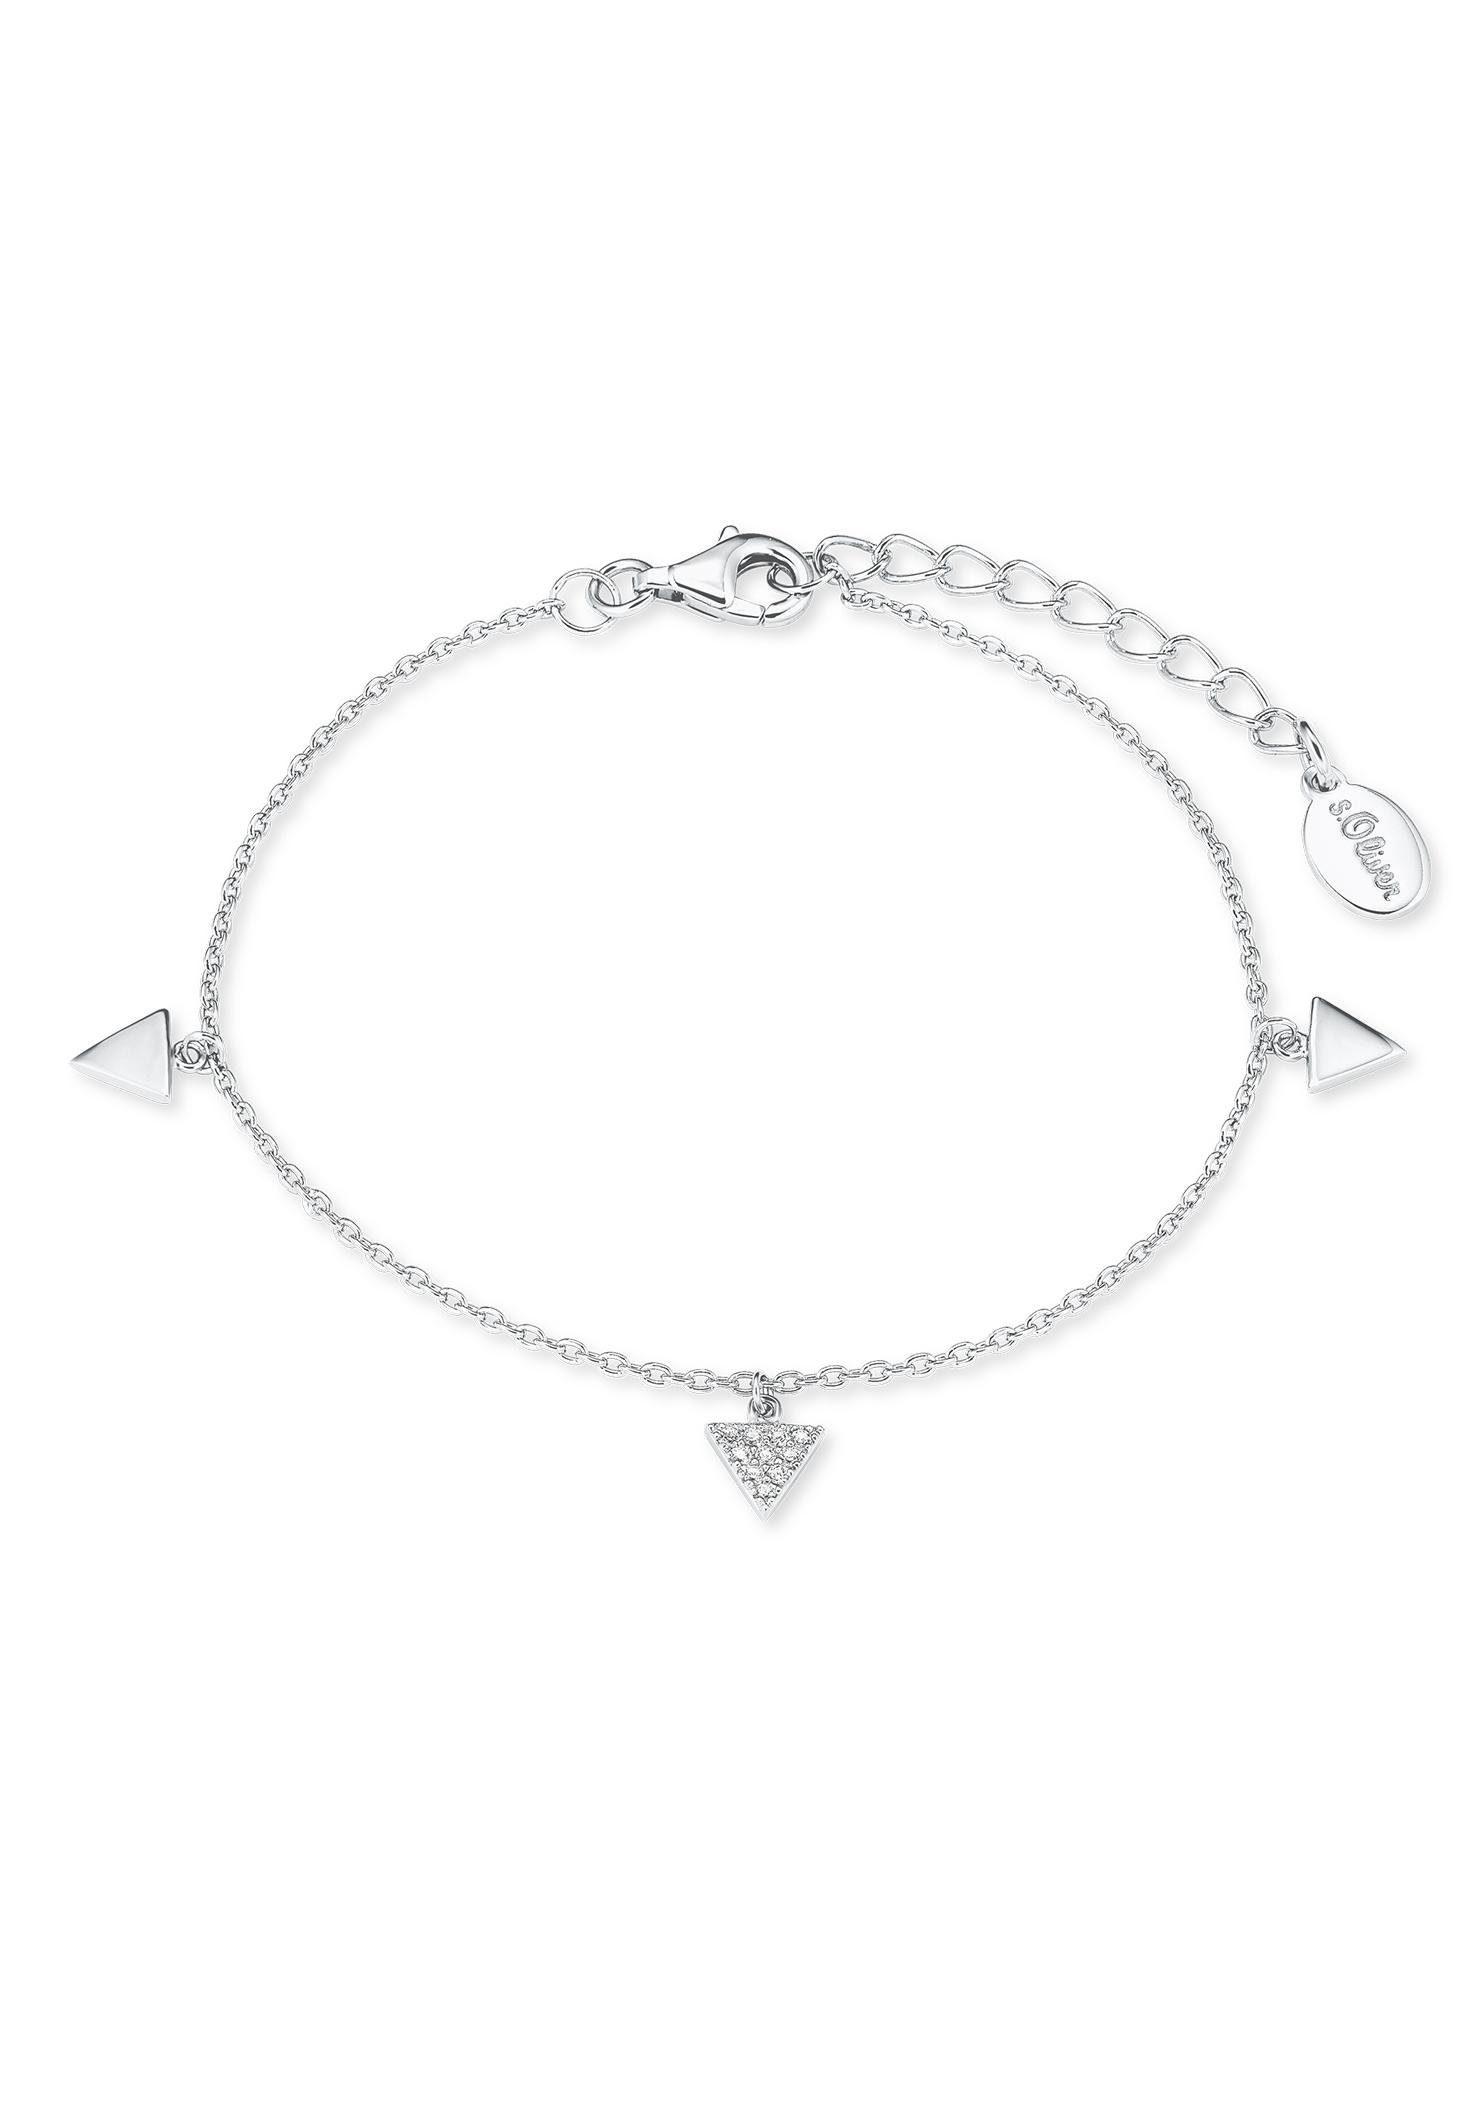 s.Oliver RED LABEL Silberarmband »Dreiecke, 2021827« mit Zirkonia